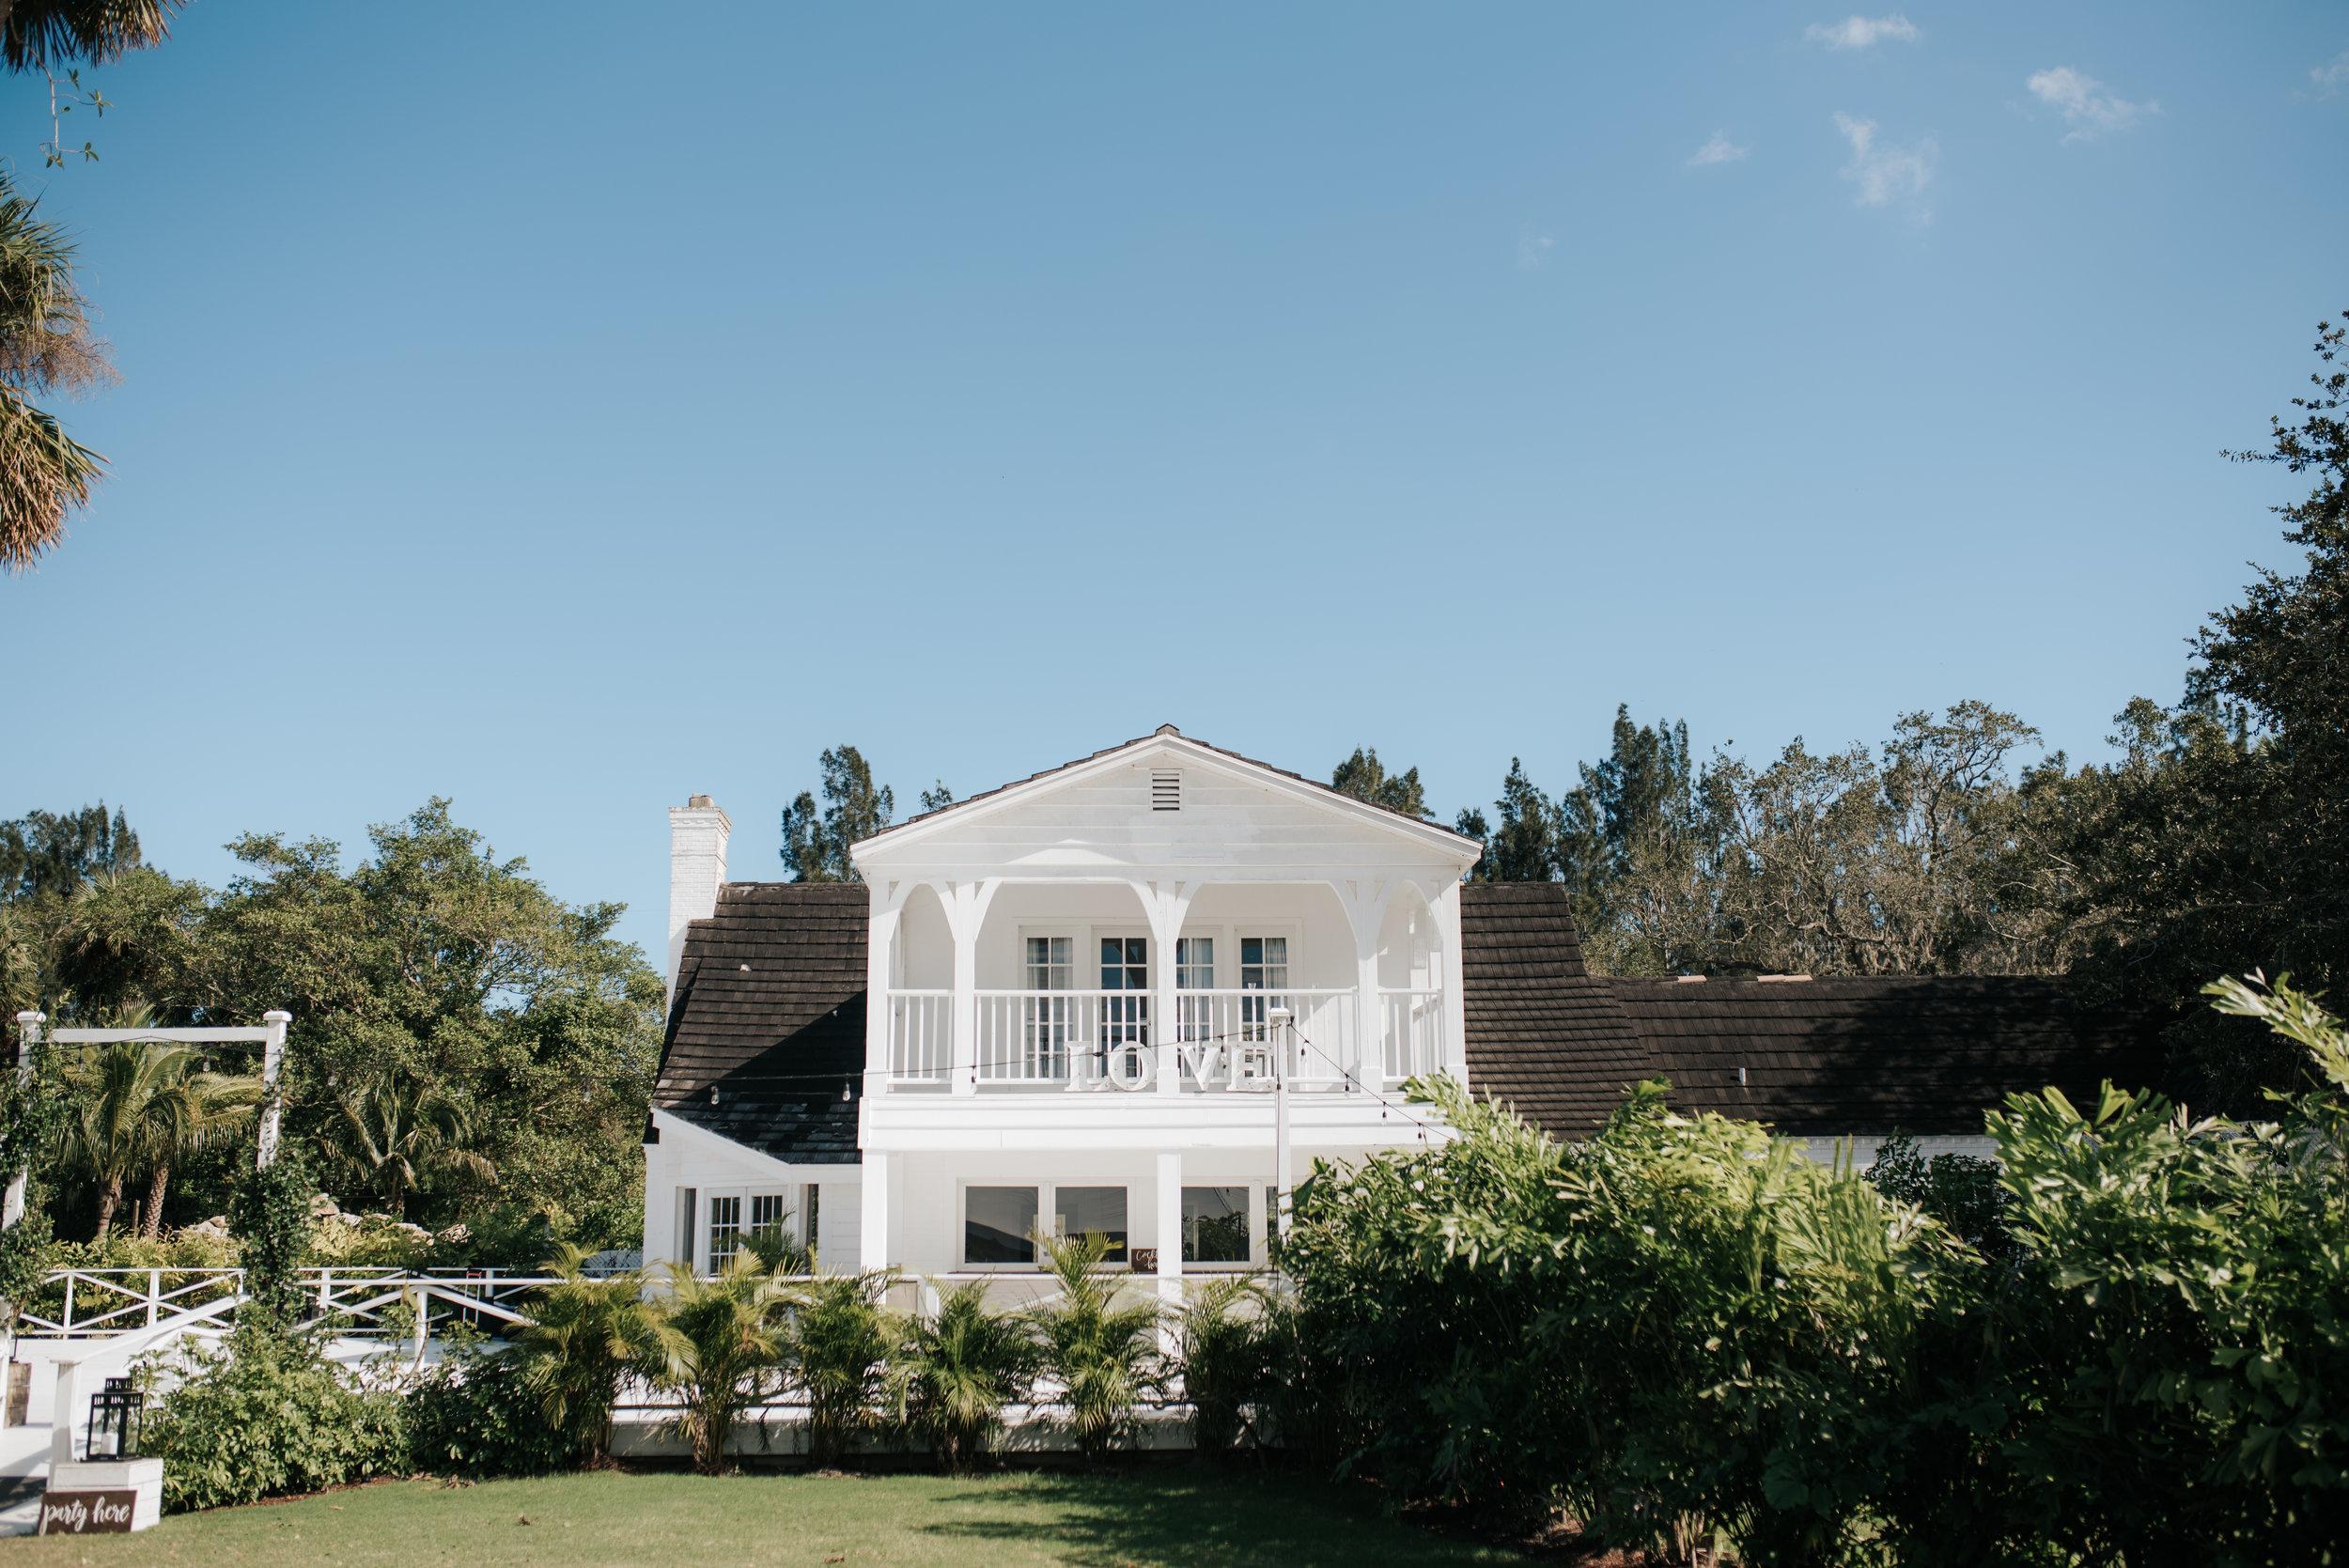 micayla-greyson-neumann-vero-beach-lake-house-winter-white-wedding-photography-98.jpg